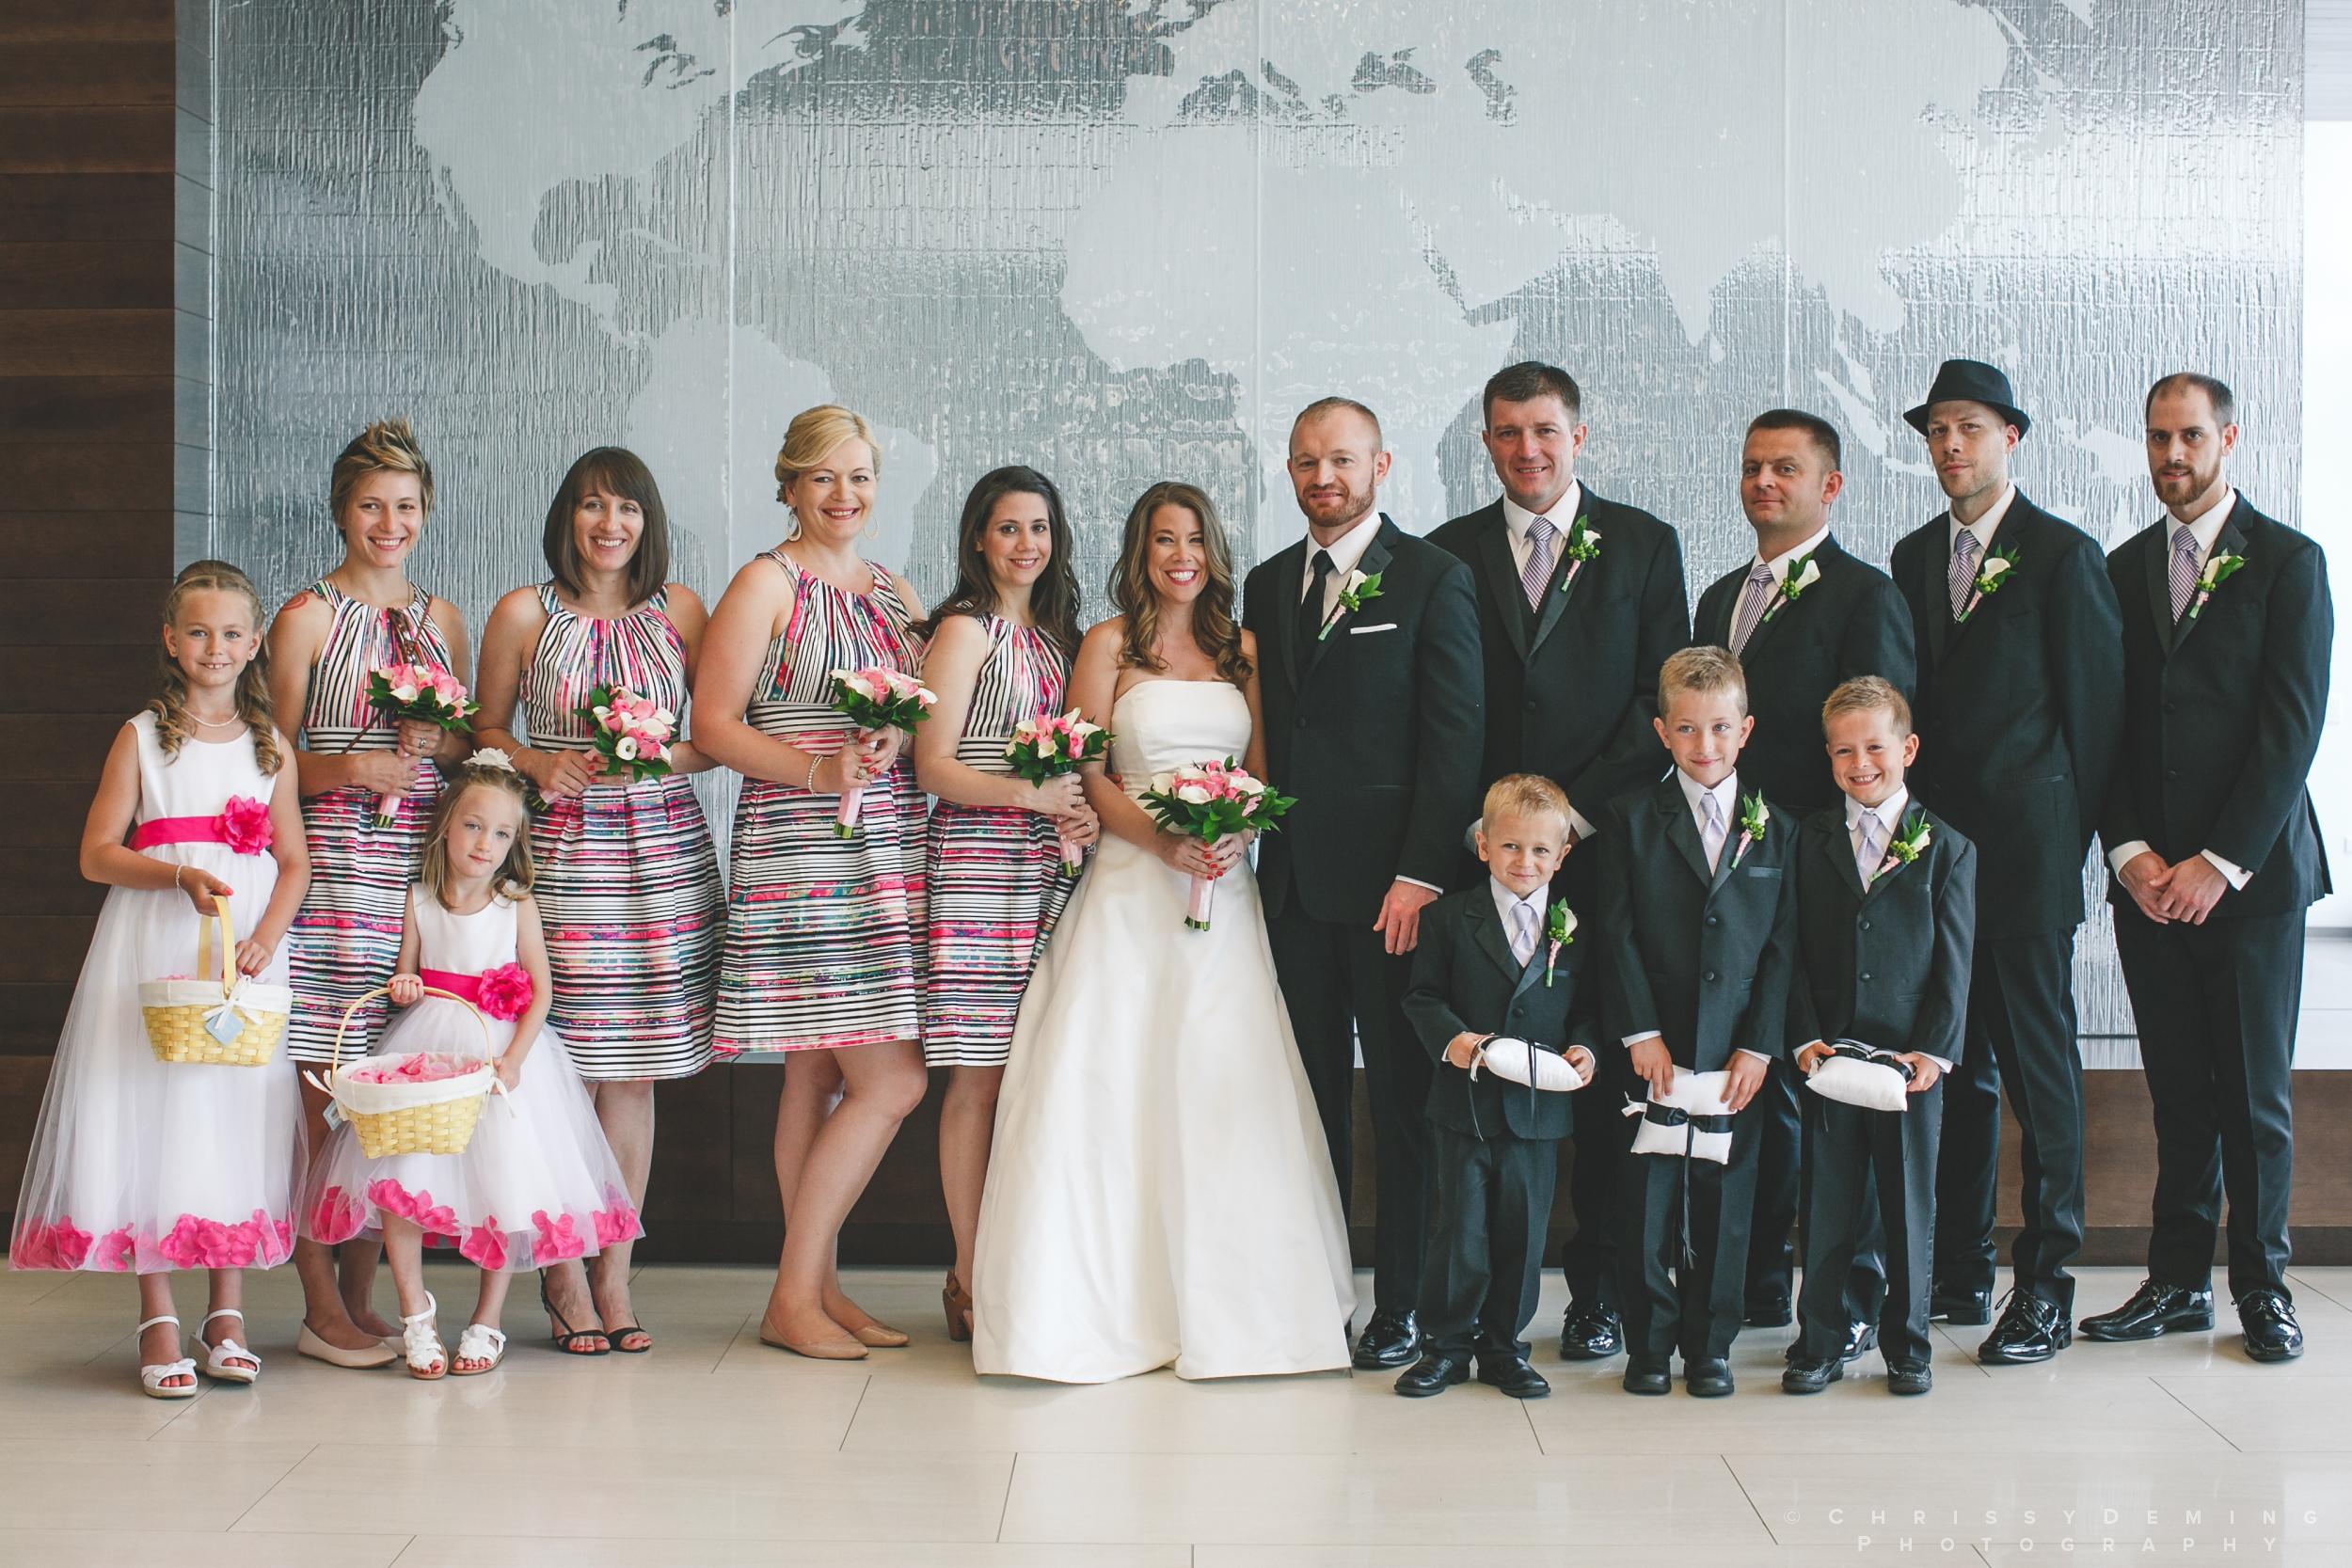 benedictine_lisle_wedding_photographer_0019.jpg